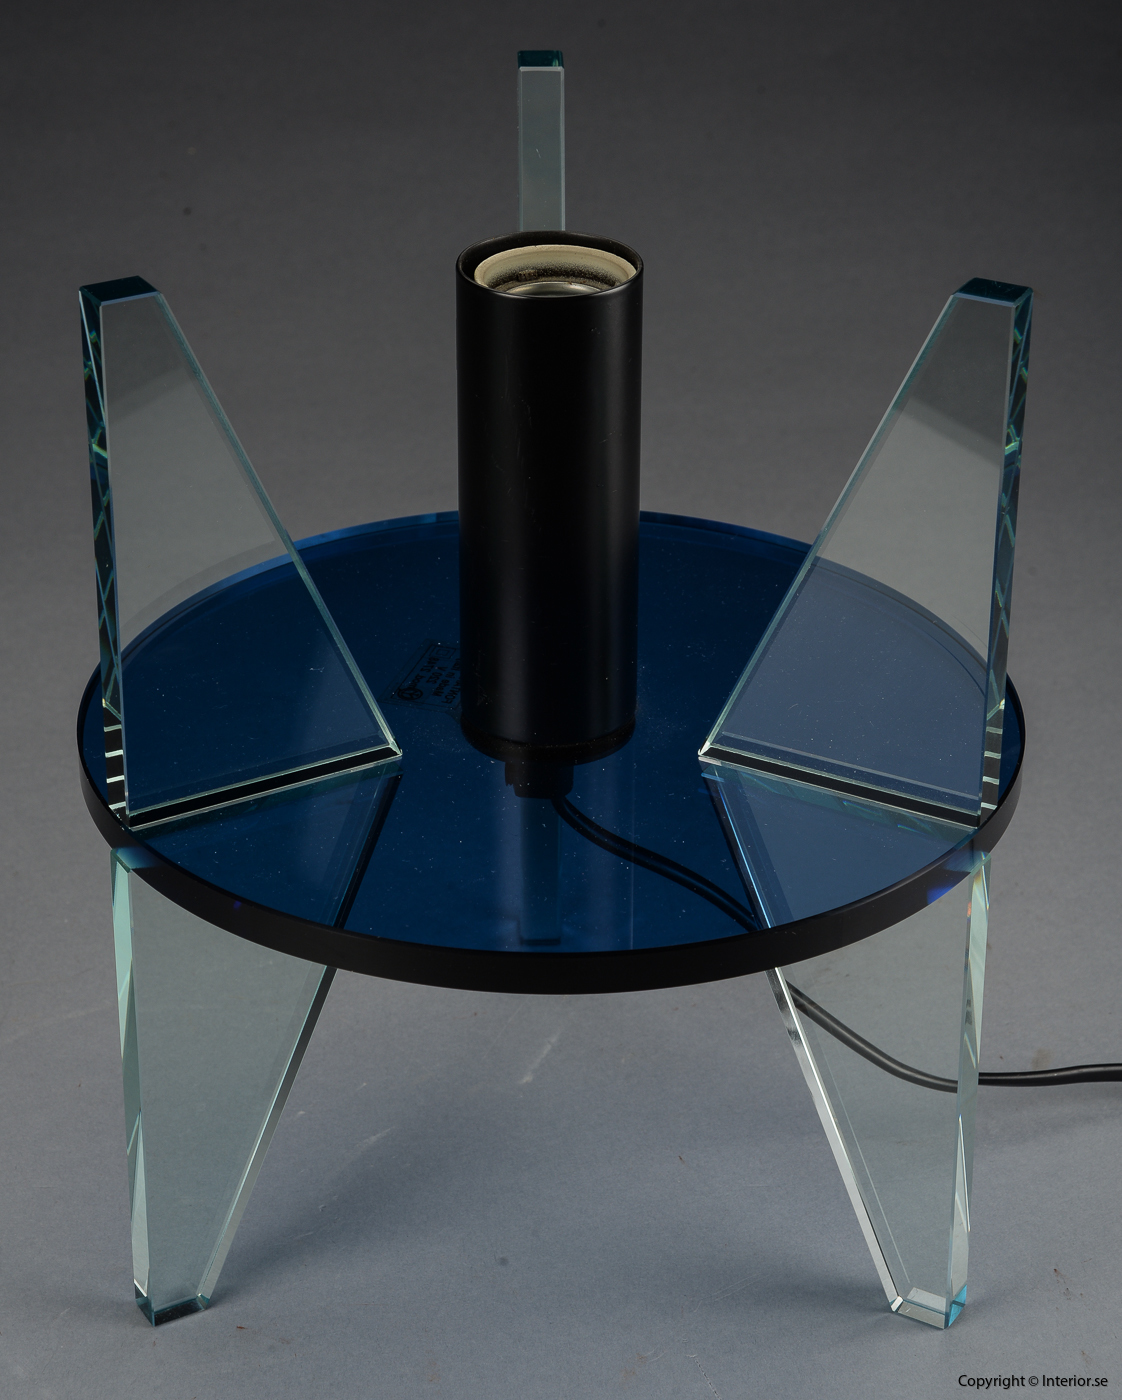 Bordslampa table lamp tischlampen Fontana Arte Otero - Design Rodolfo Dordoni 6